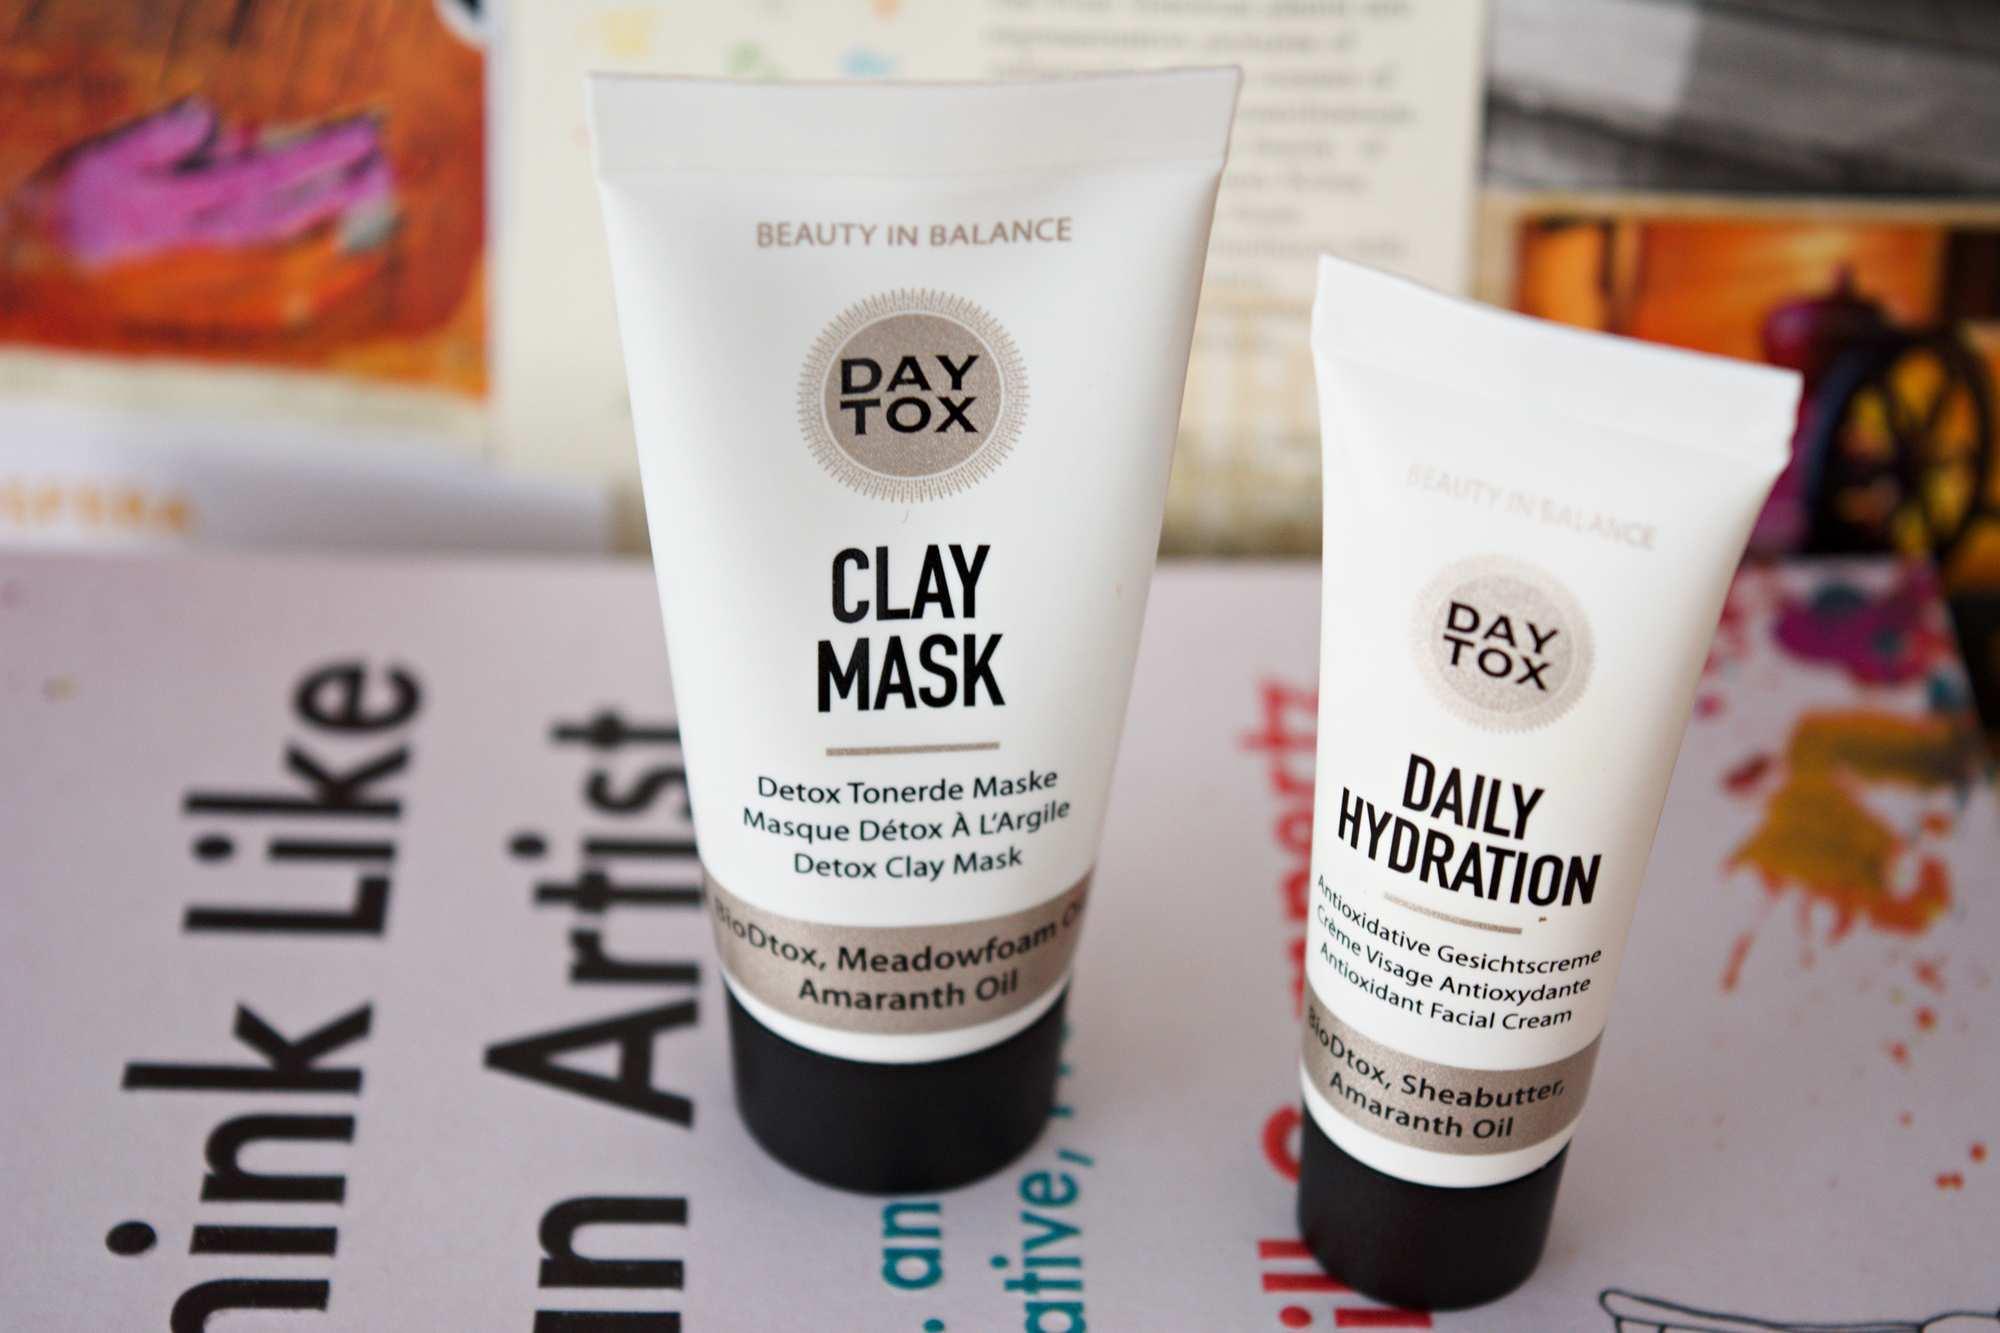 produse cosmetice daytox